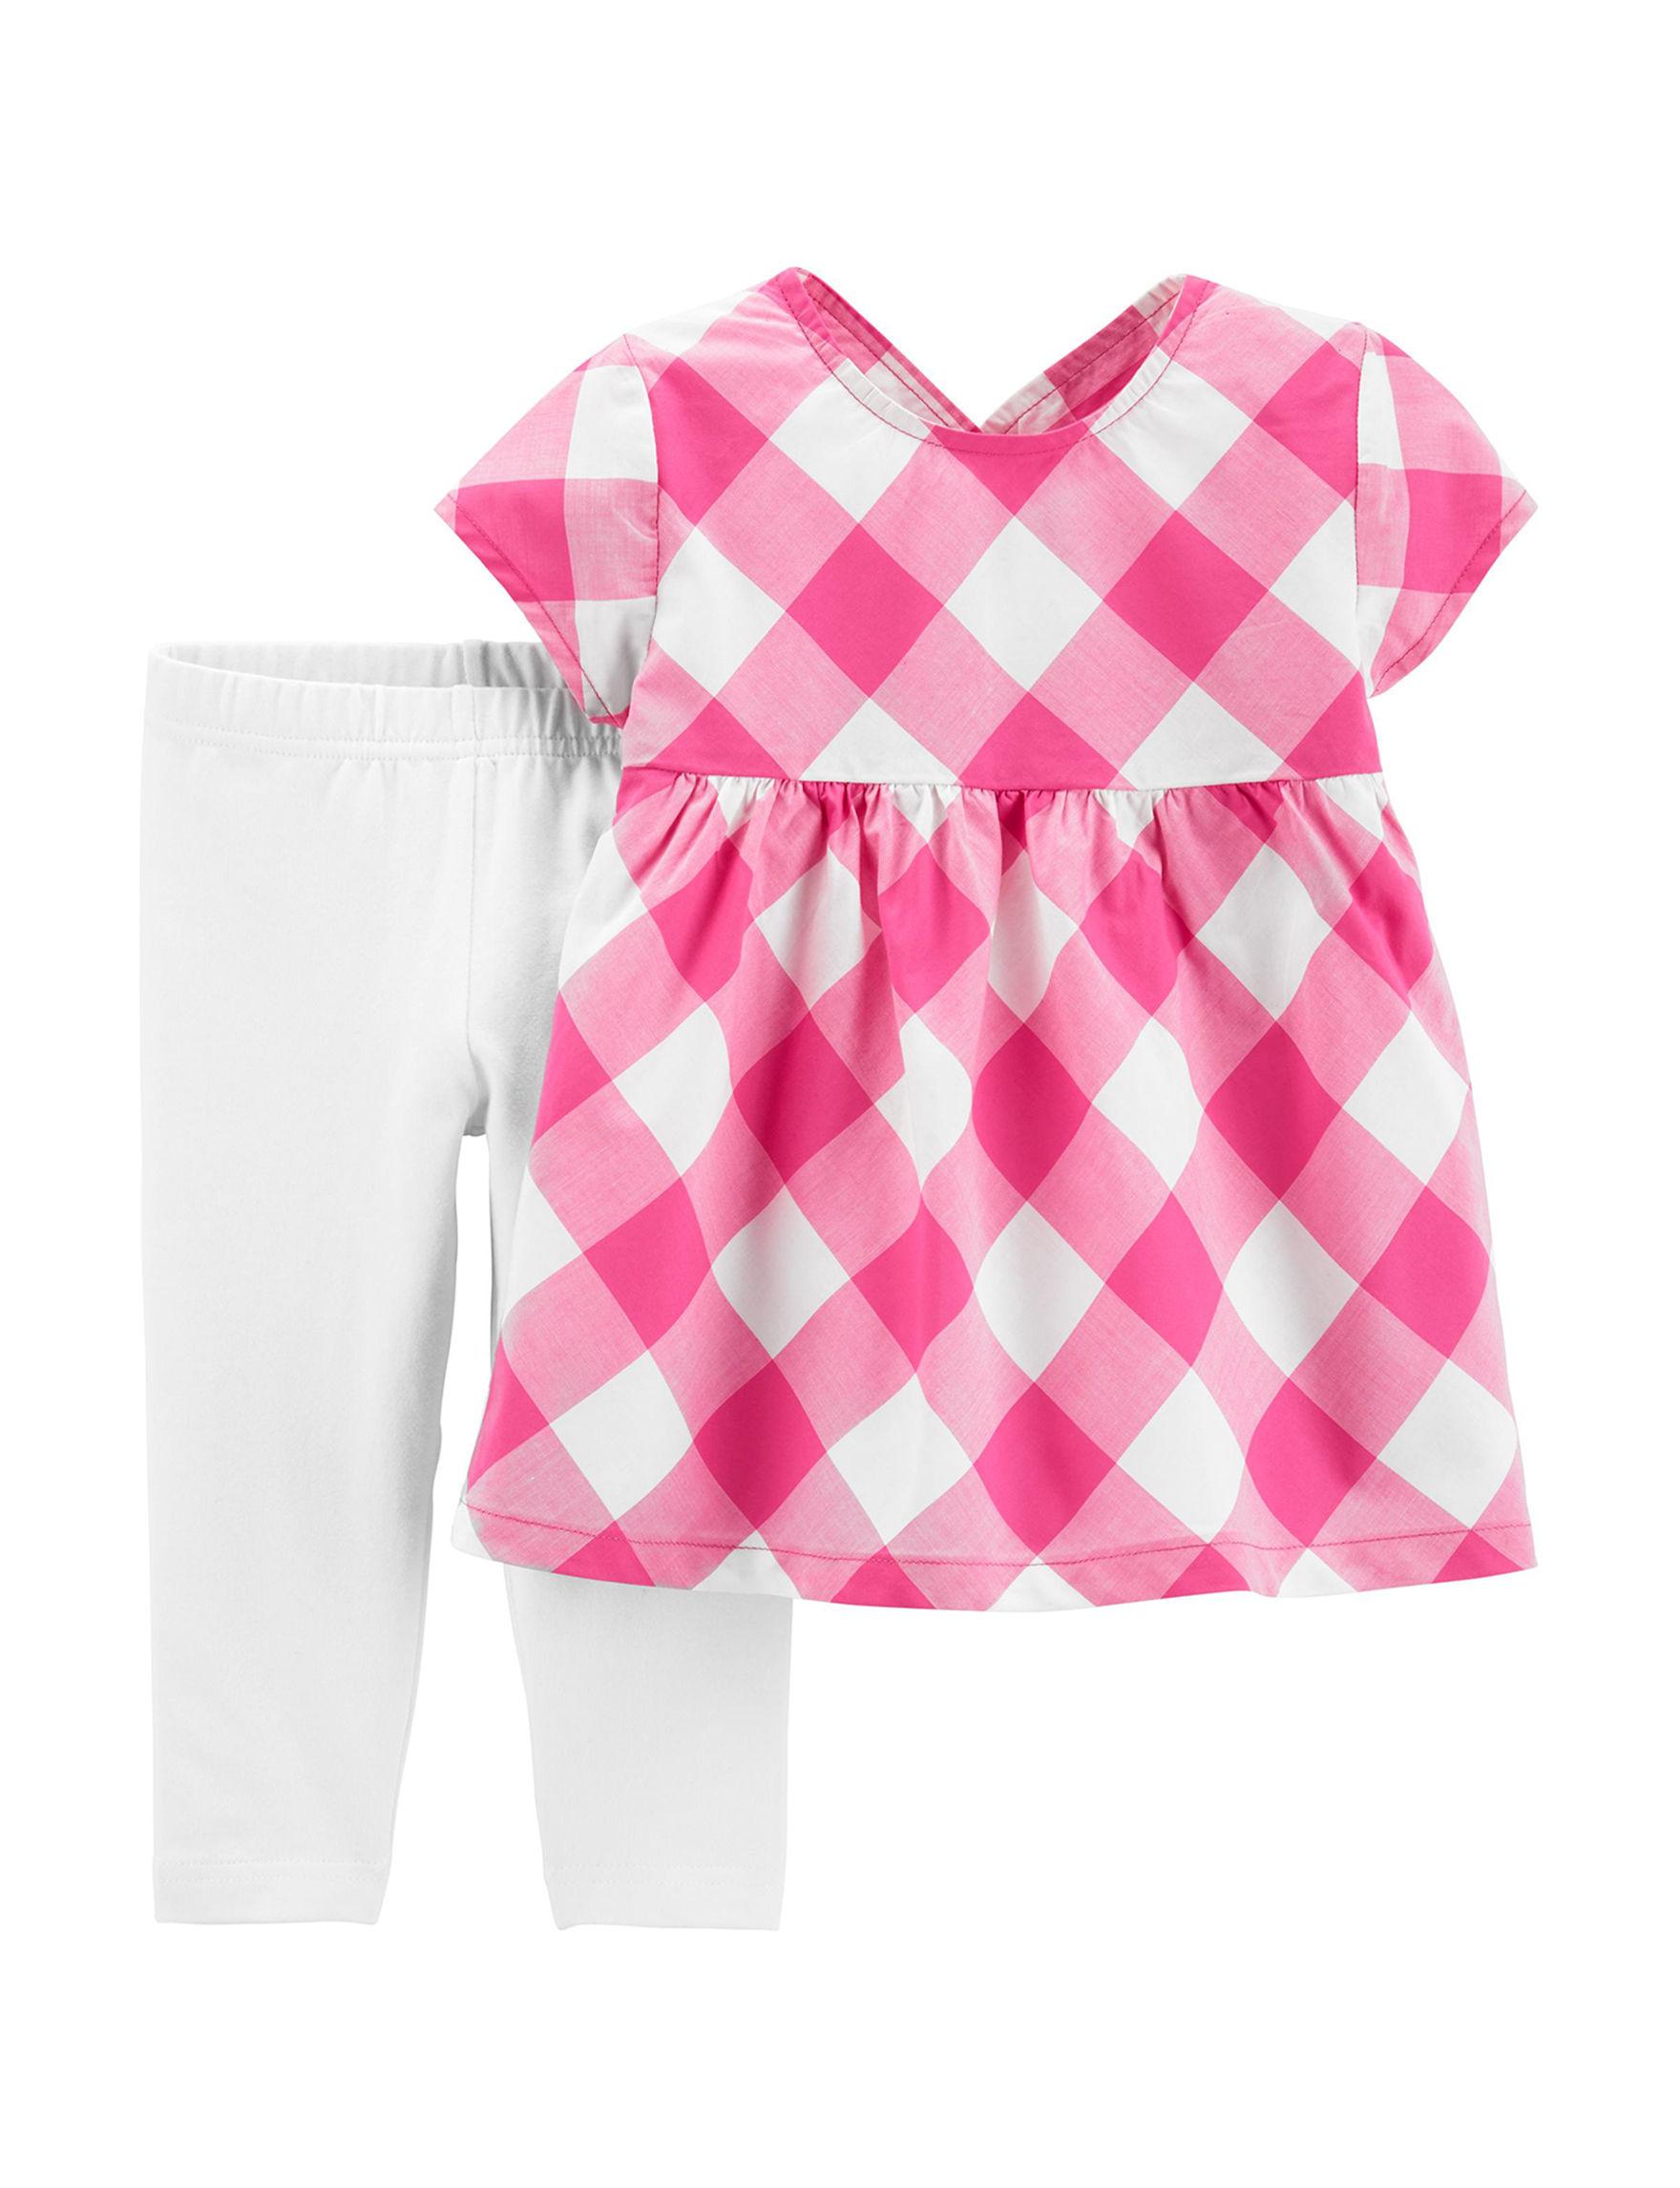 Carter's Pink / White